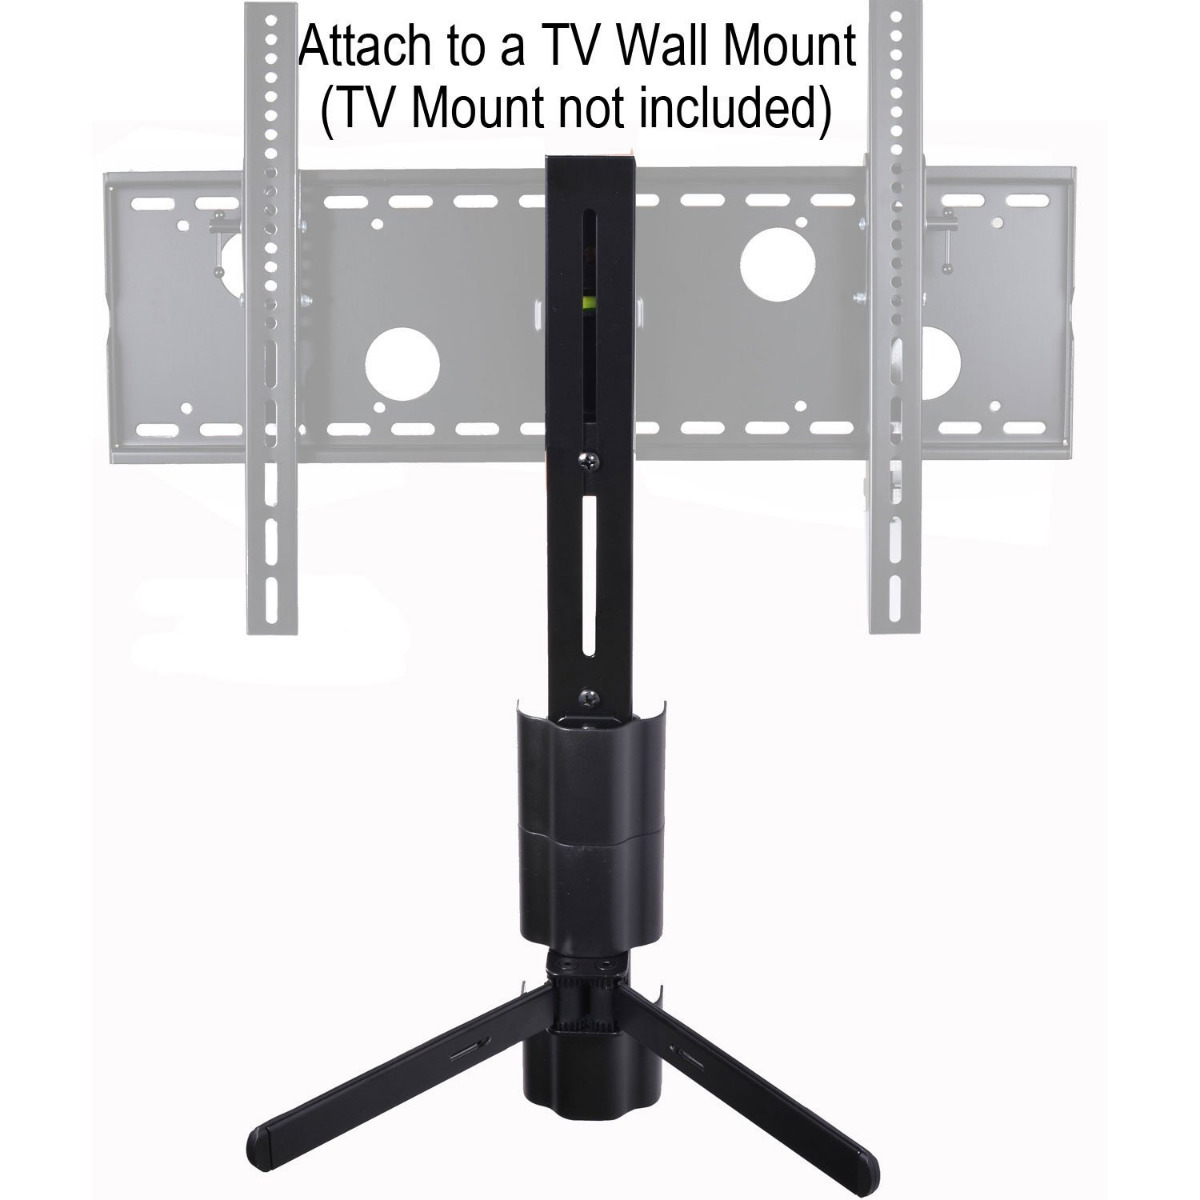 dvd wall mount shelf component cable box game console dvr bracket under tv 1vh. Black Bedroom Furniture Sets. Home Design Ideas